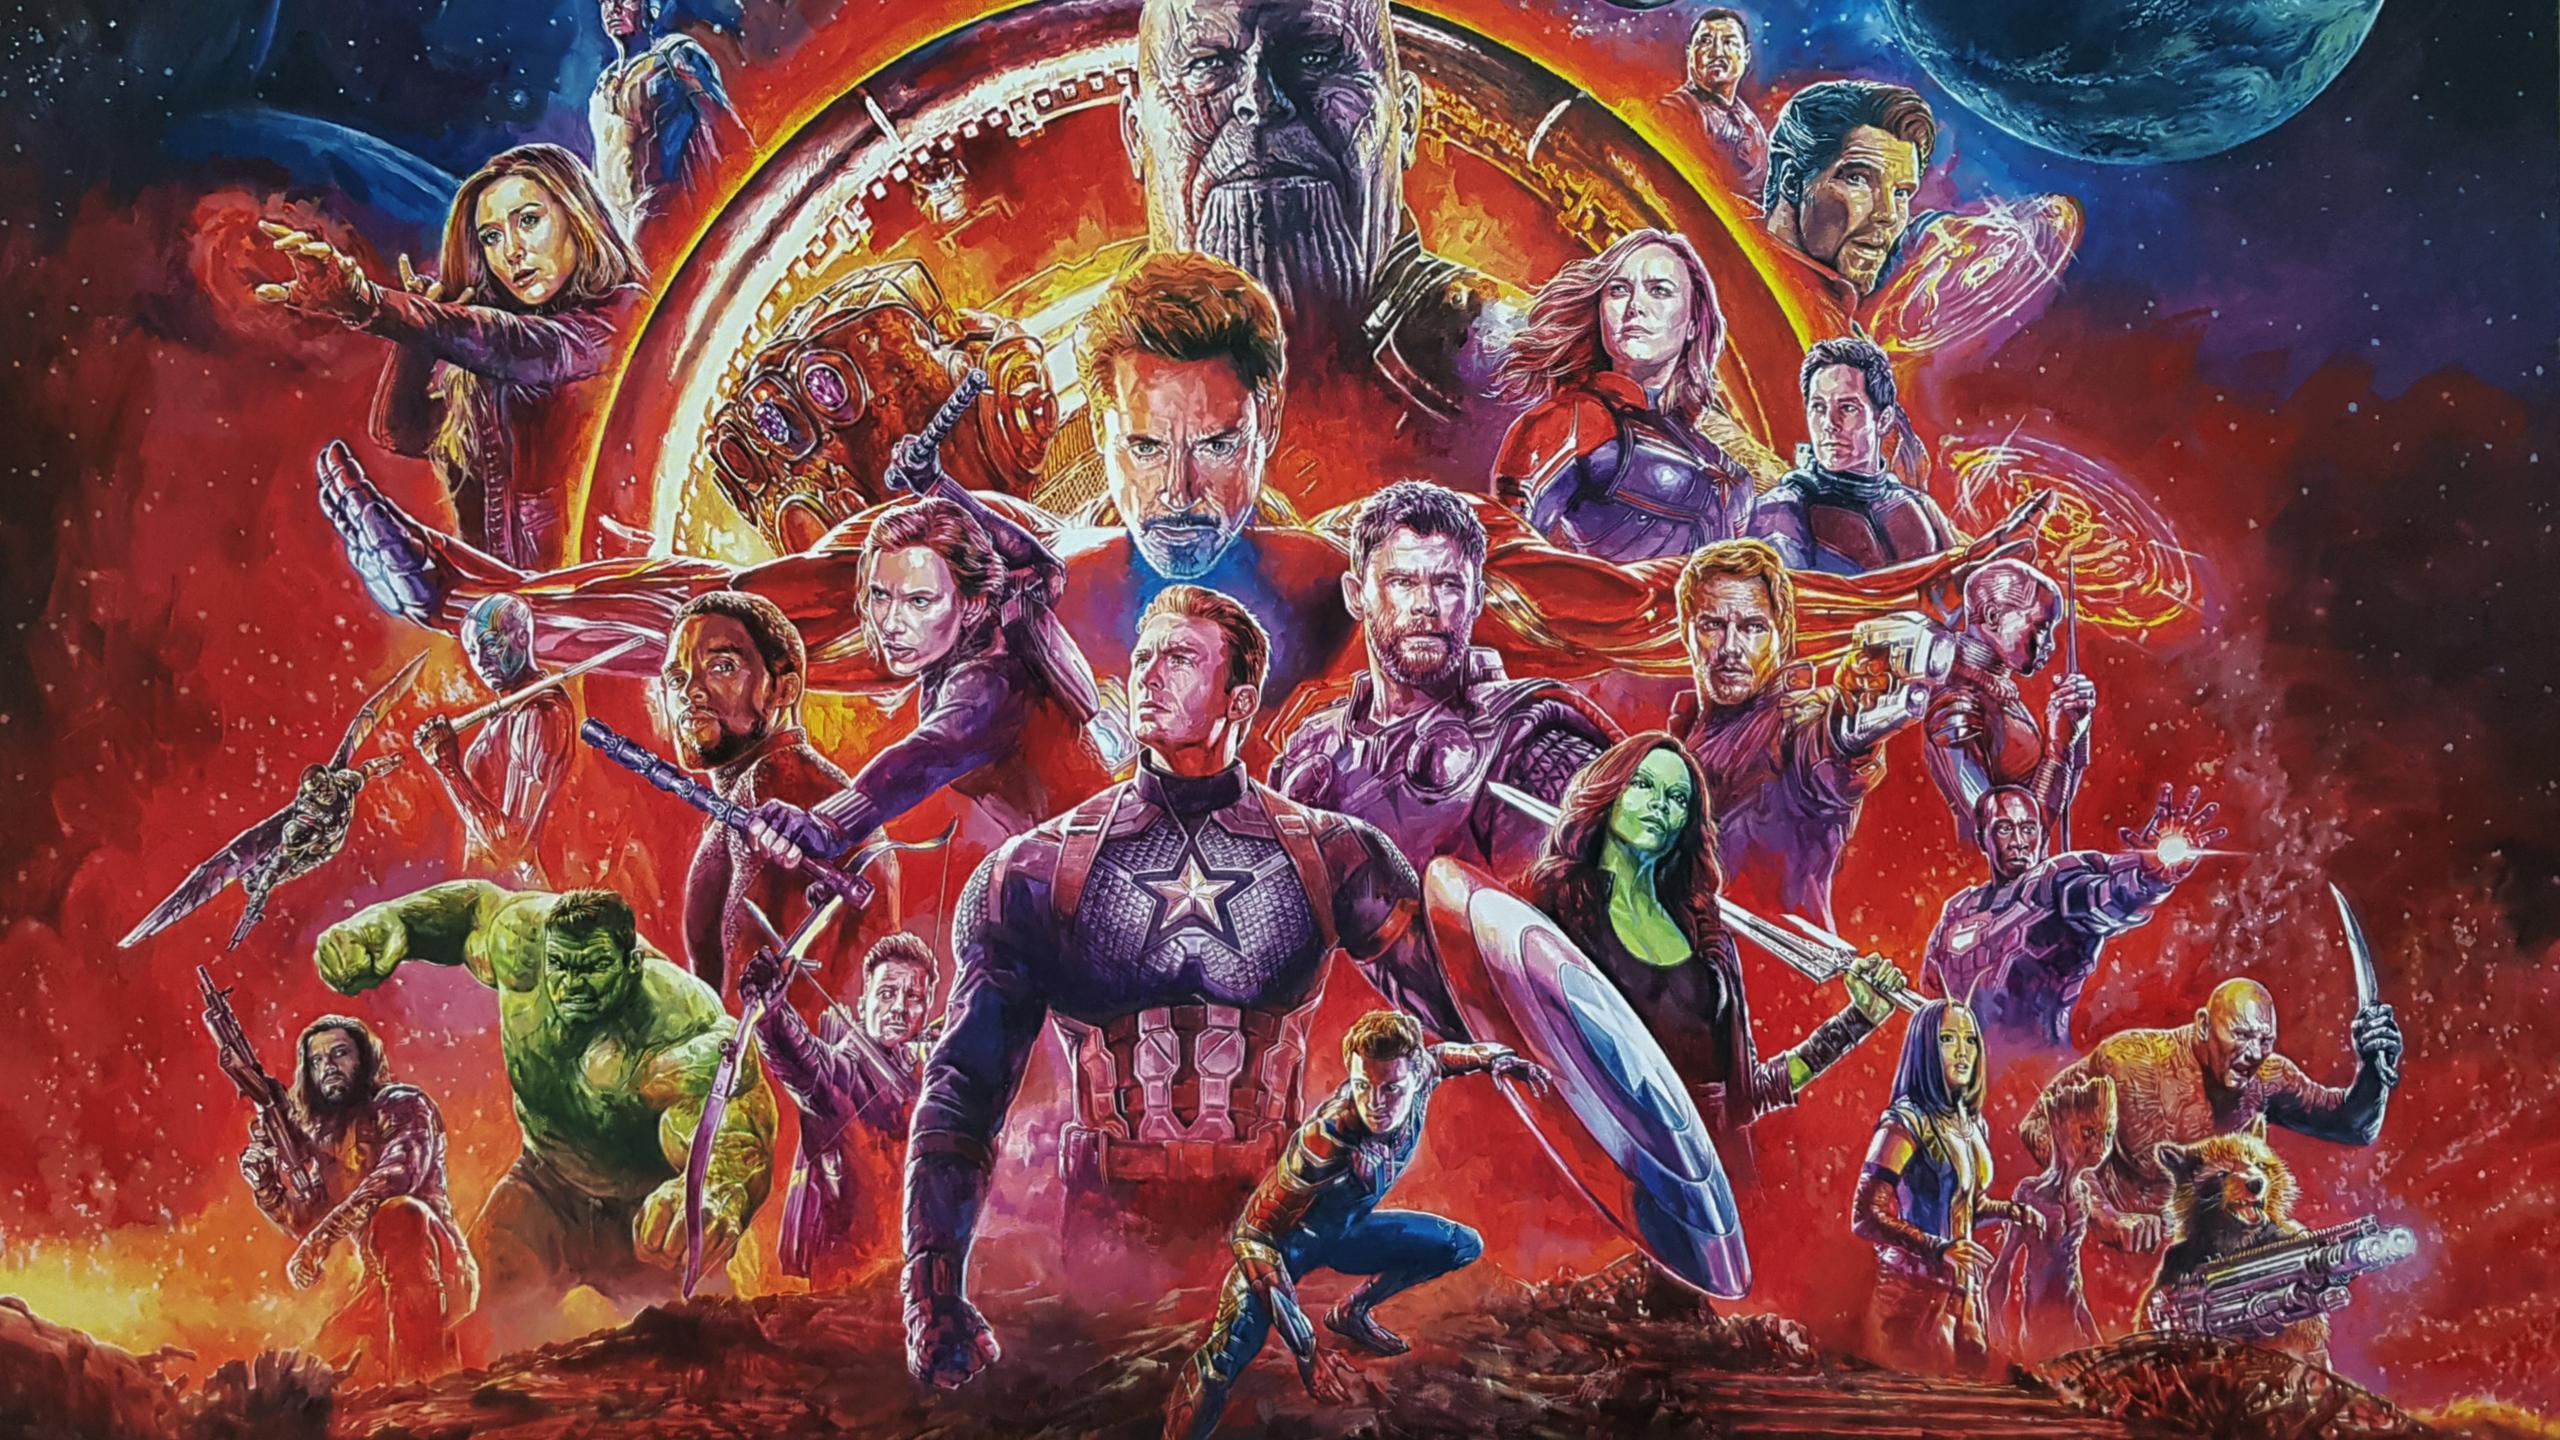 2560x1440 avengers infinity war sketch artwork 1440p